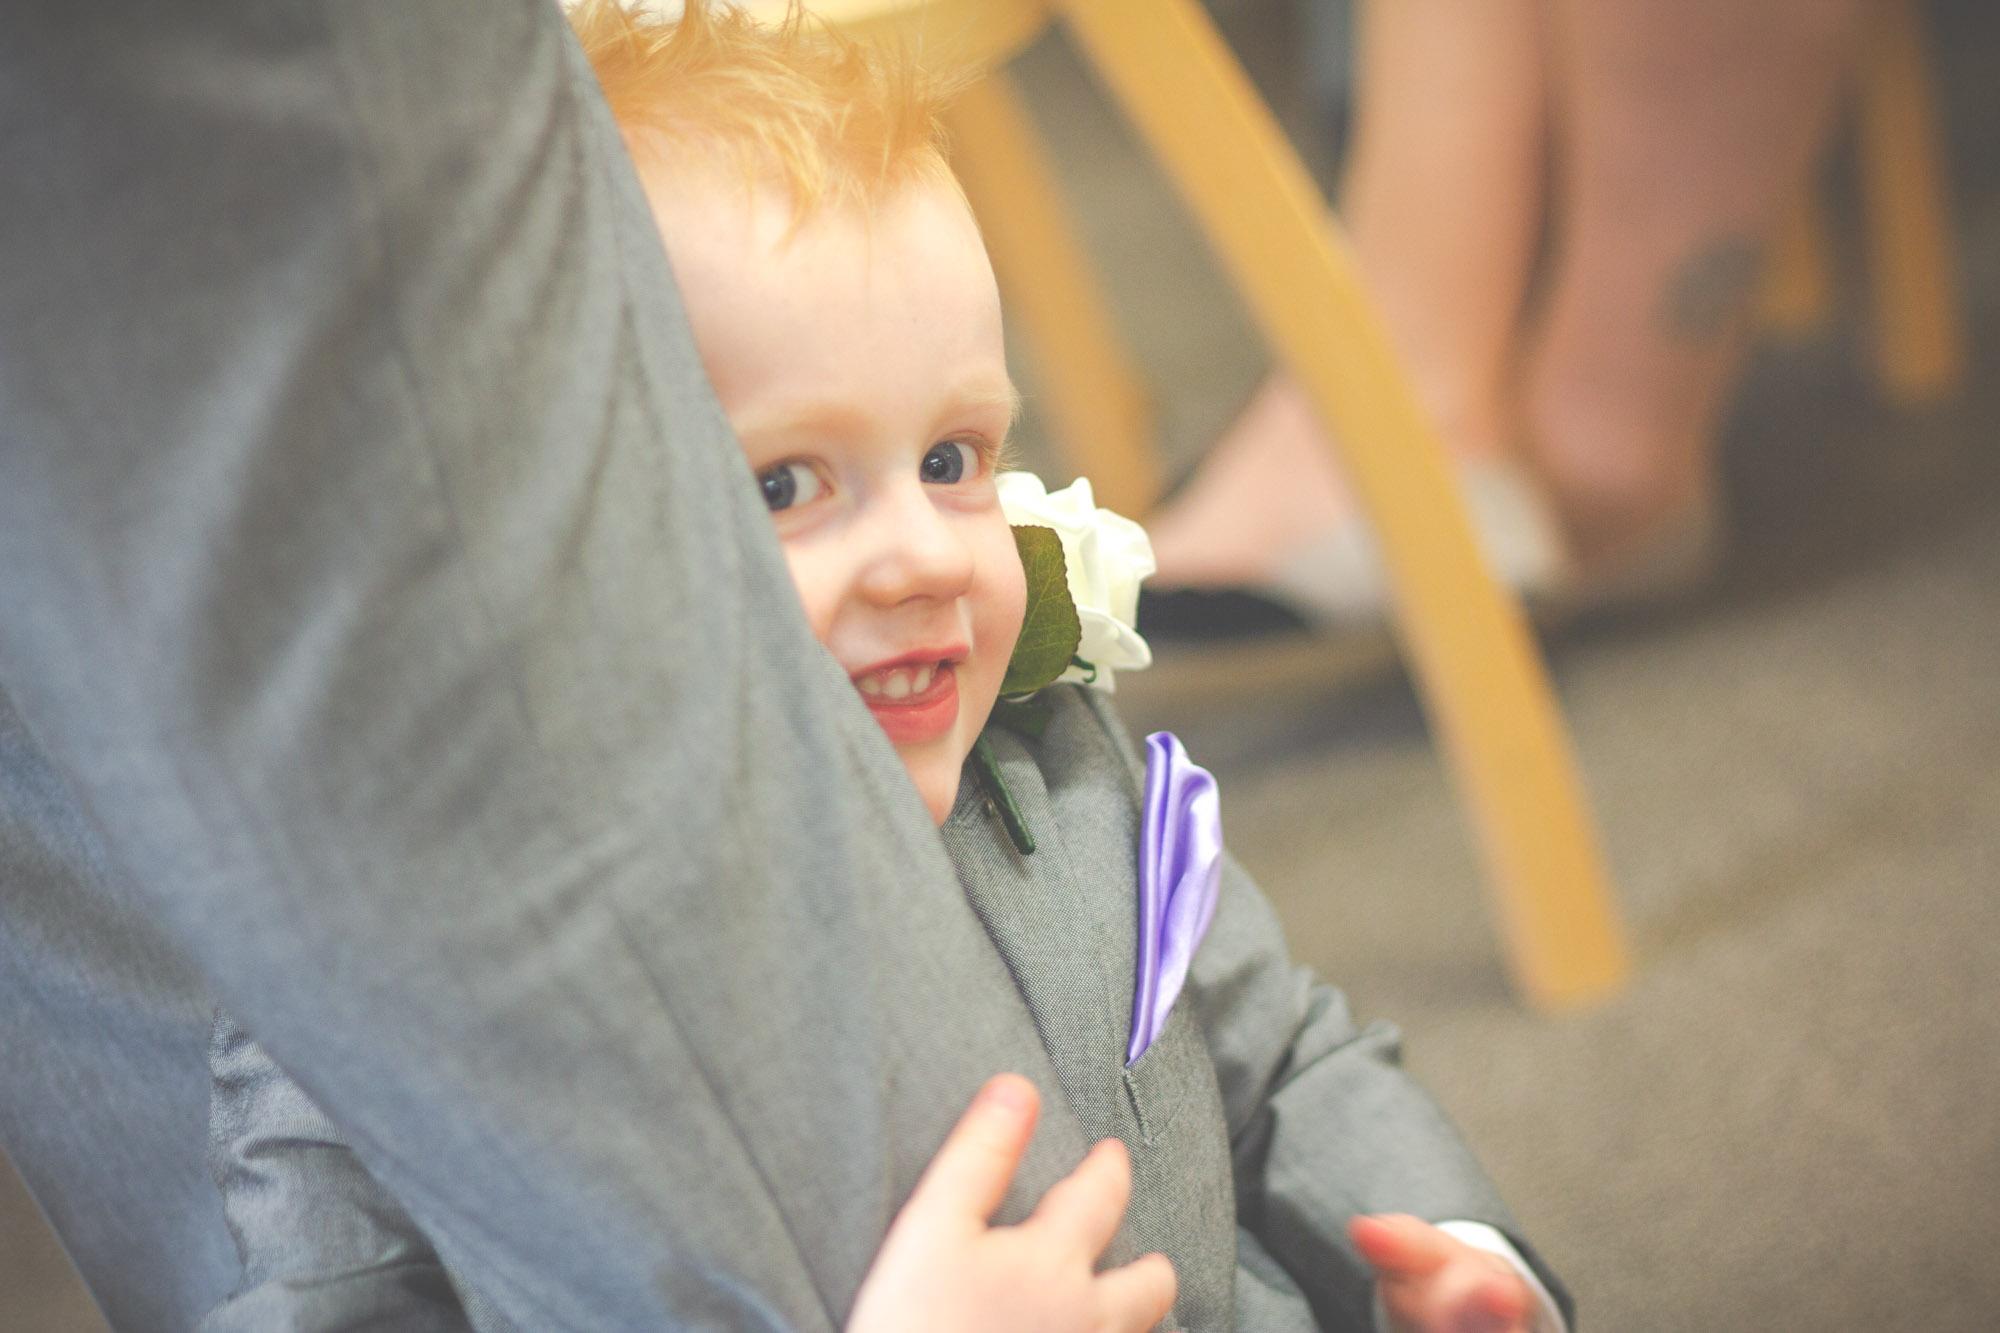 skipton-registry-office-wedding-photography-25.jpg